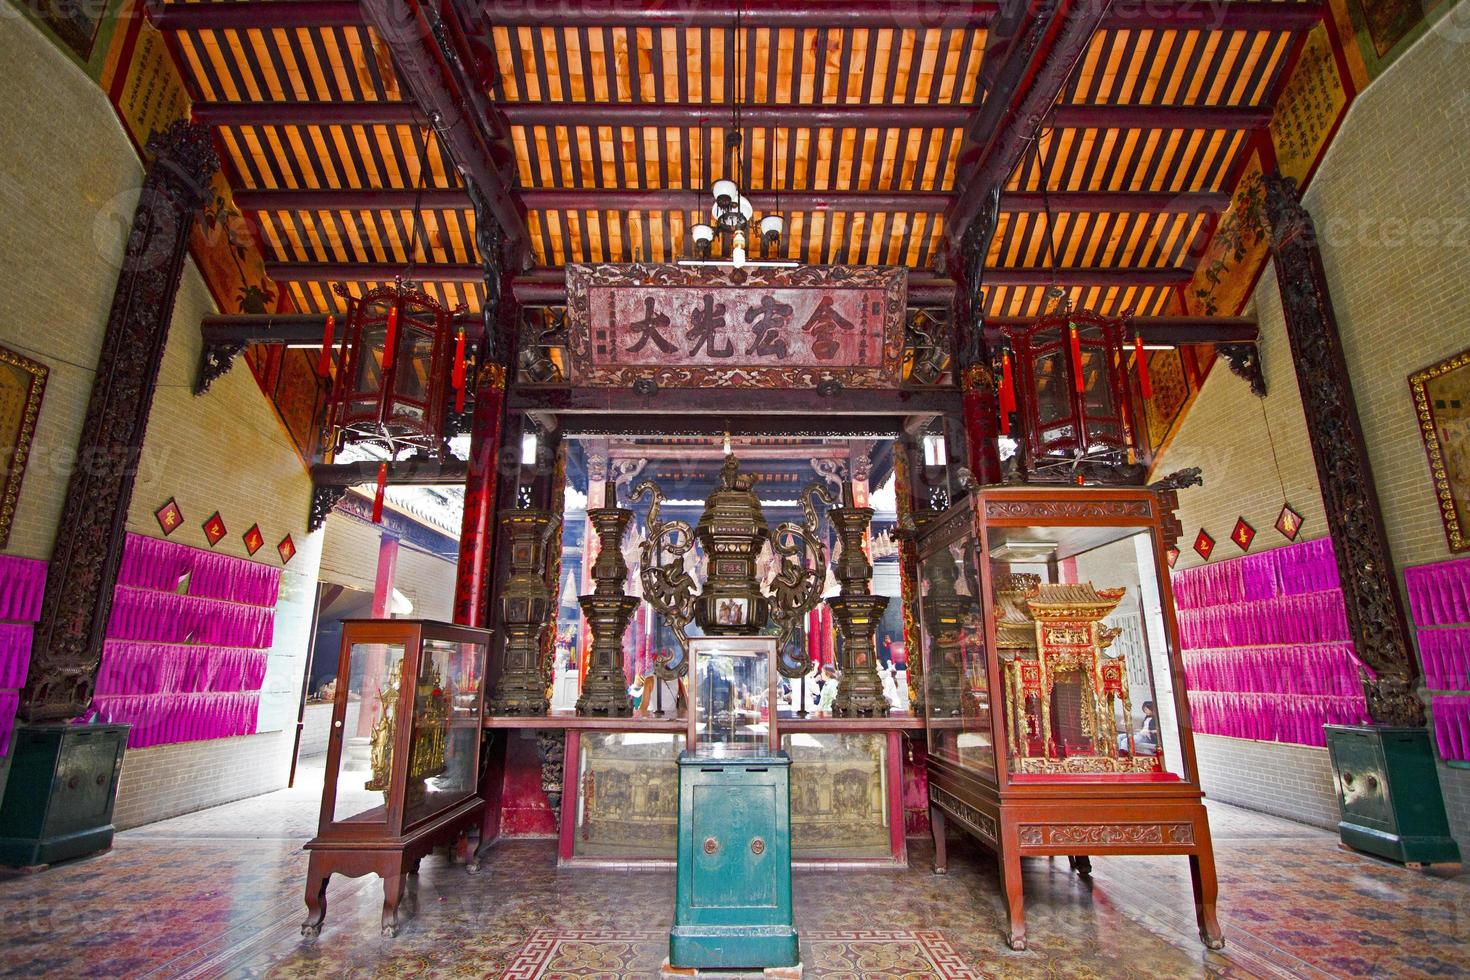 tempio cinese - Ho Chi Minh City, Vietnam foto